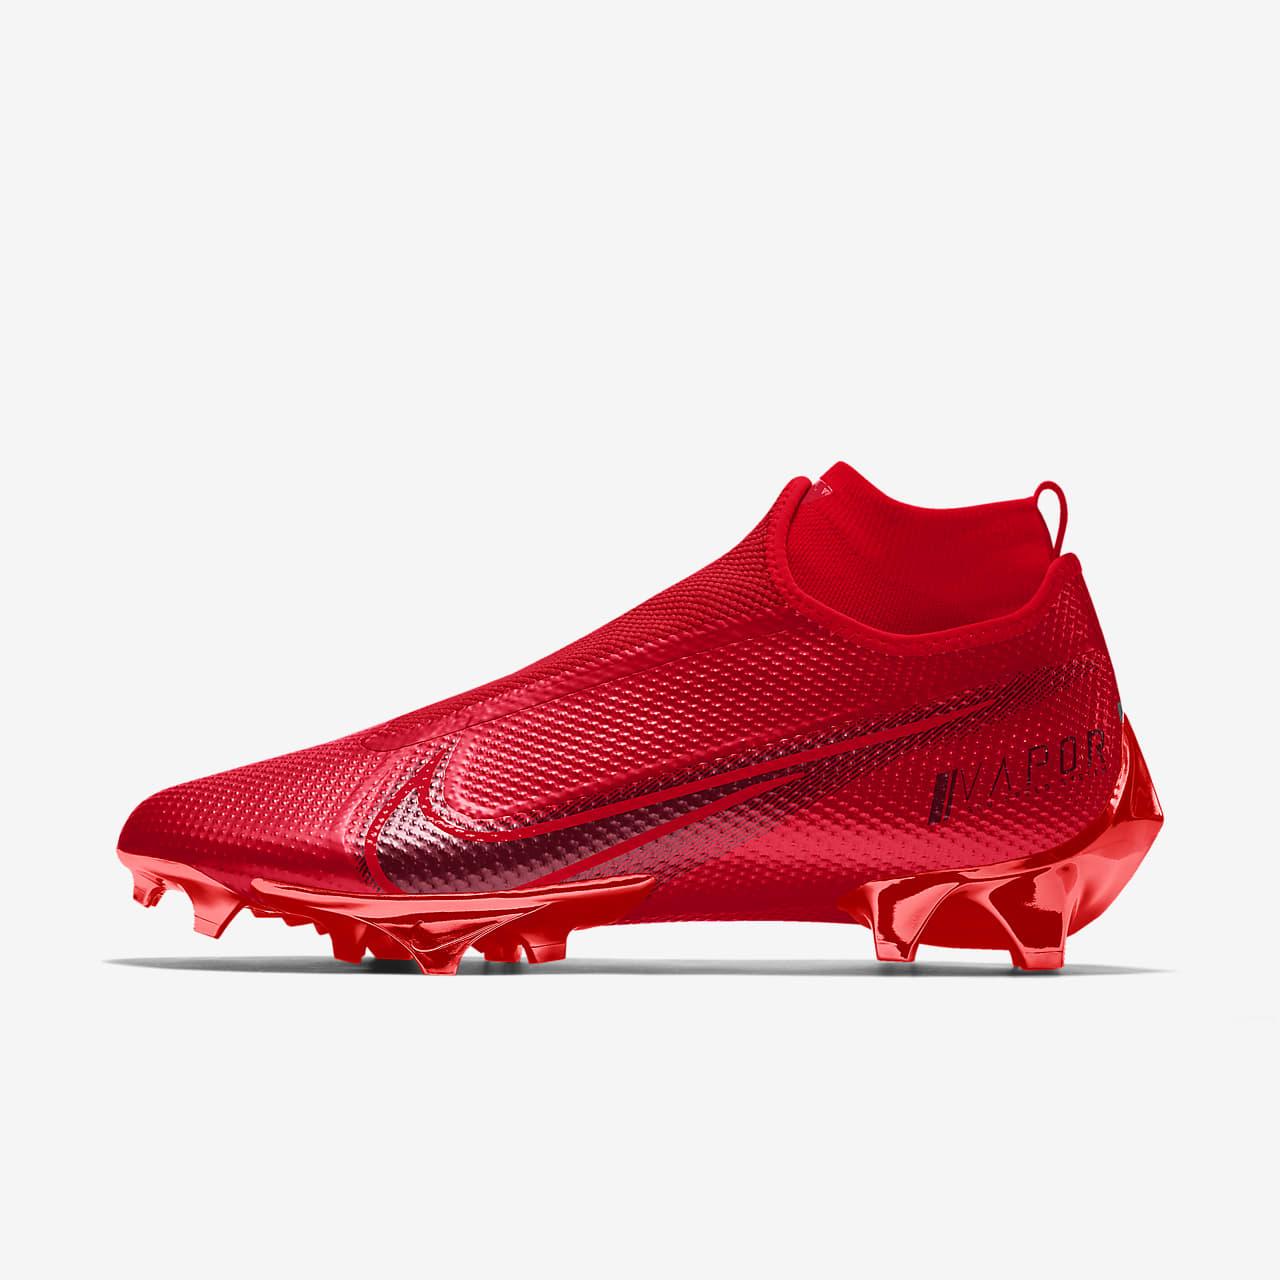 Nike Vapor Edge Pro 360 By You Custom Football Cleat